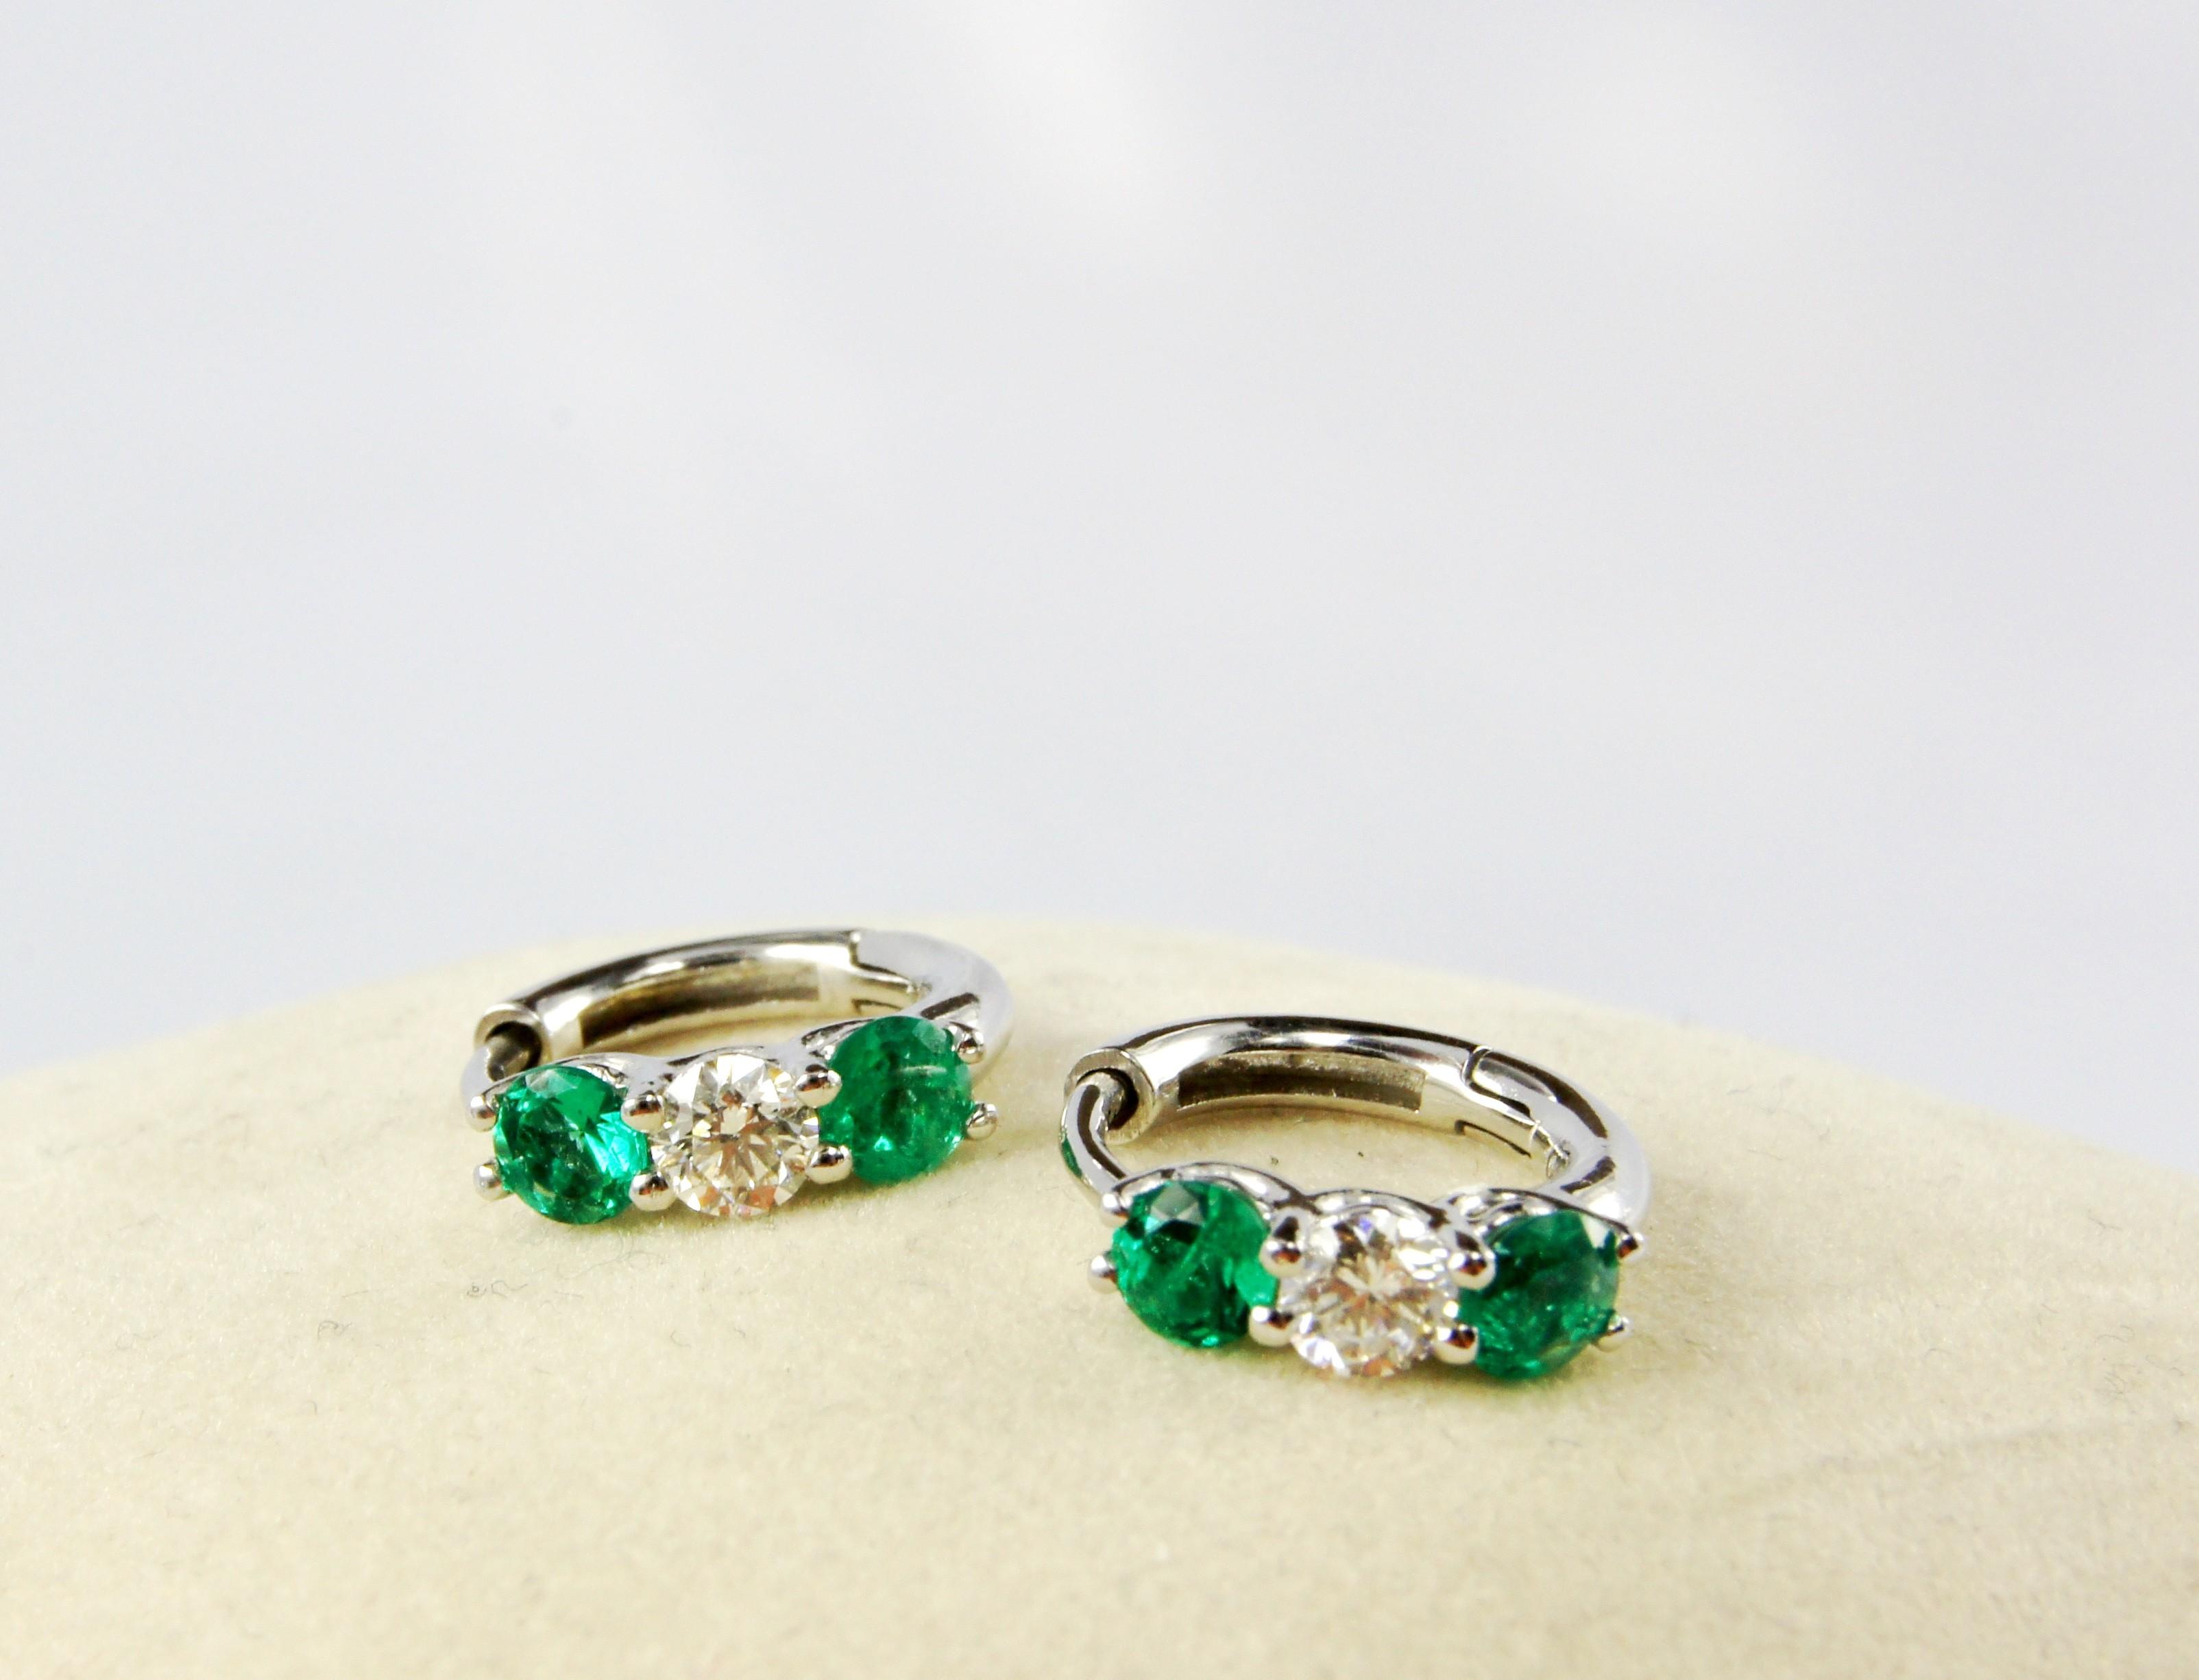 18K White Gold Diamond and Genuine Emerald loop earrings